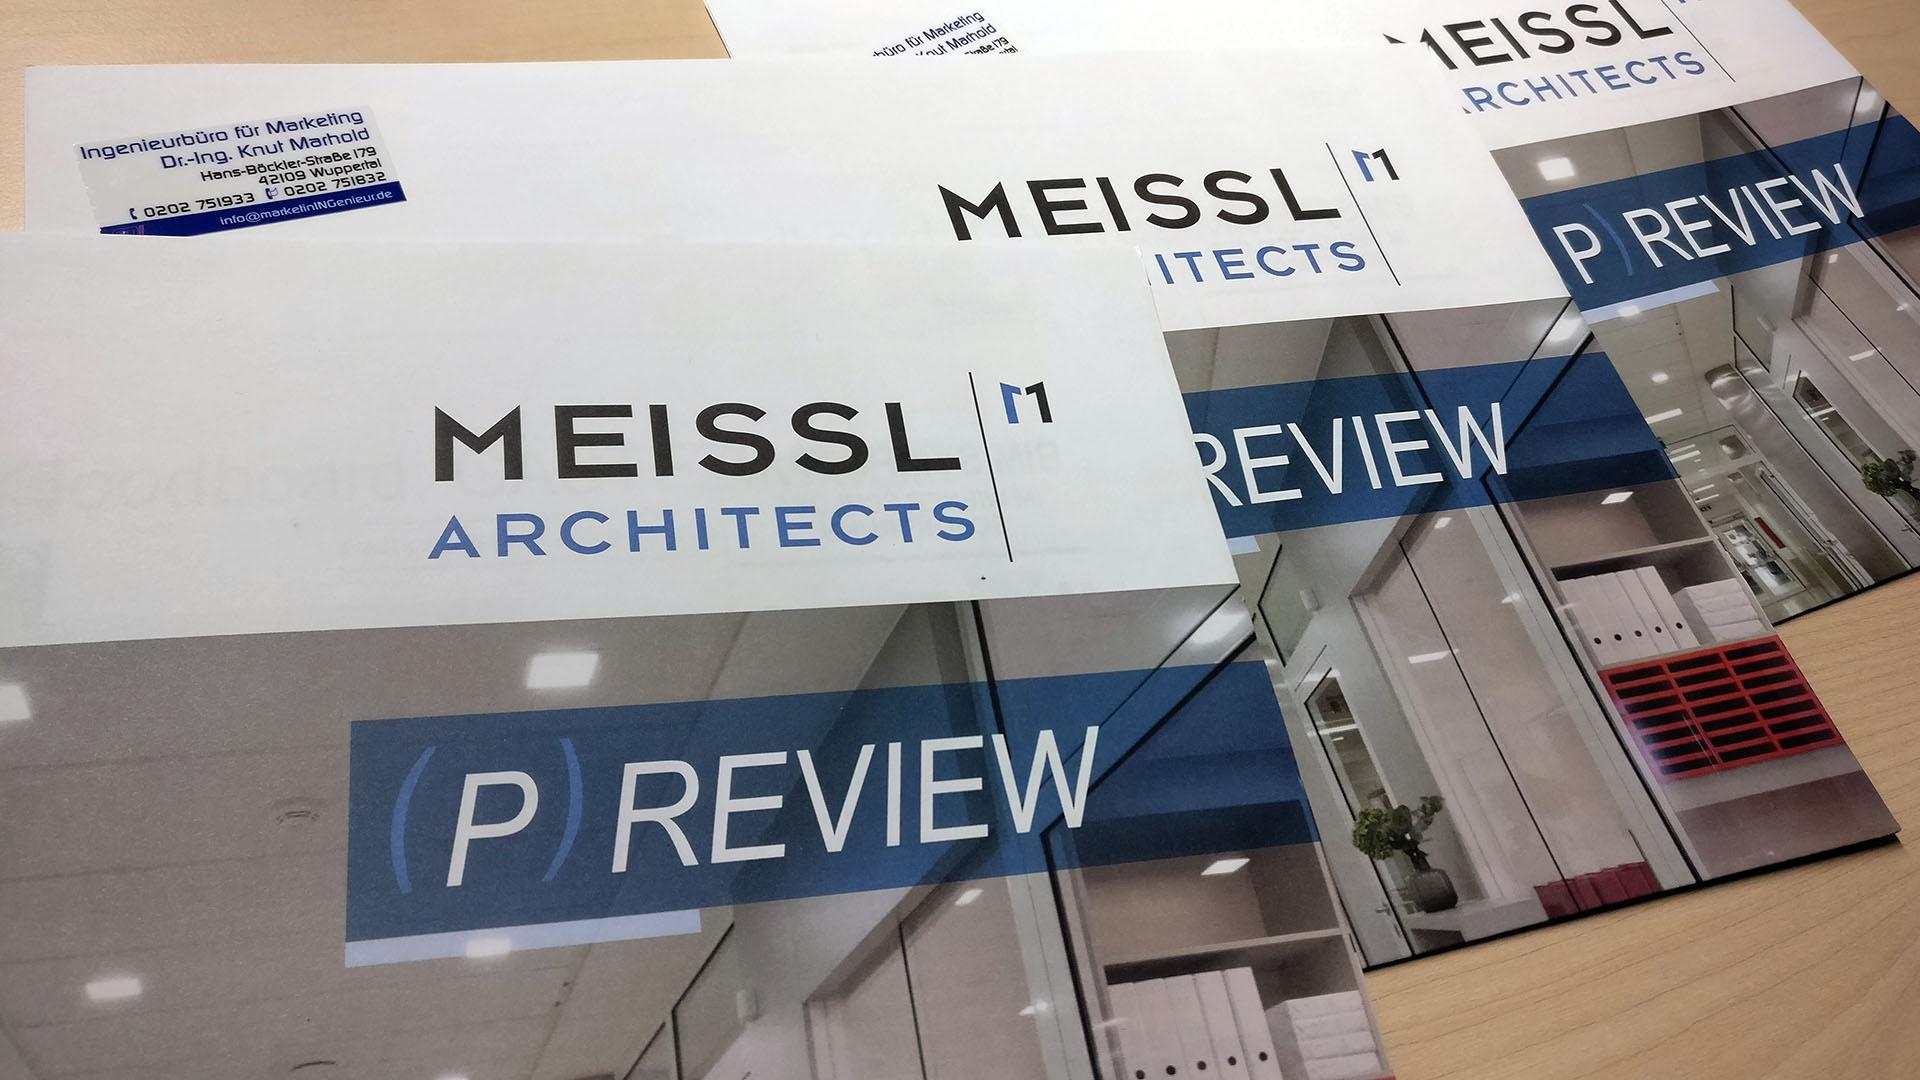 Kundenmagazin MEISSL ARCHITECTS